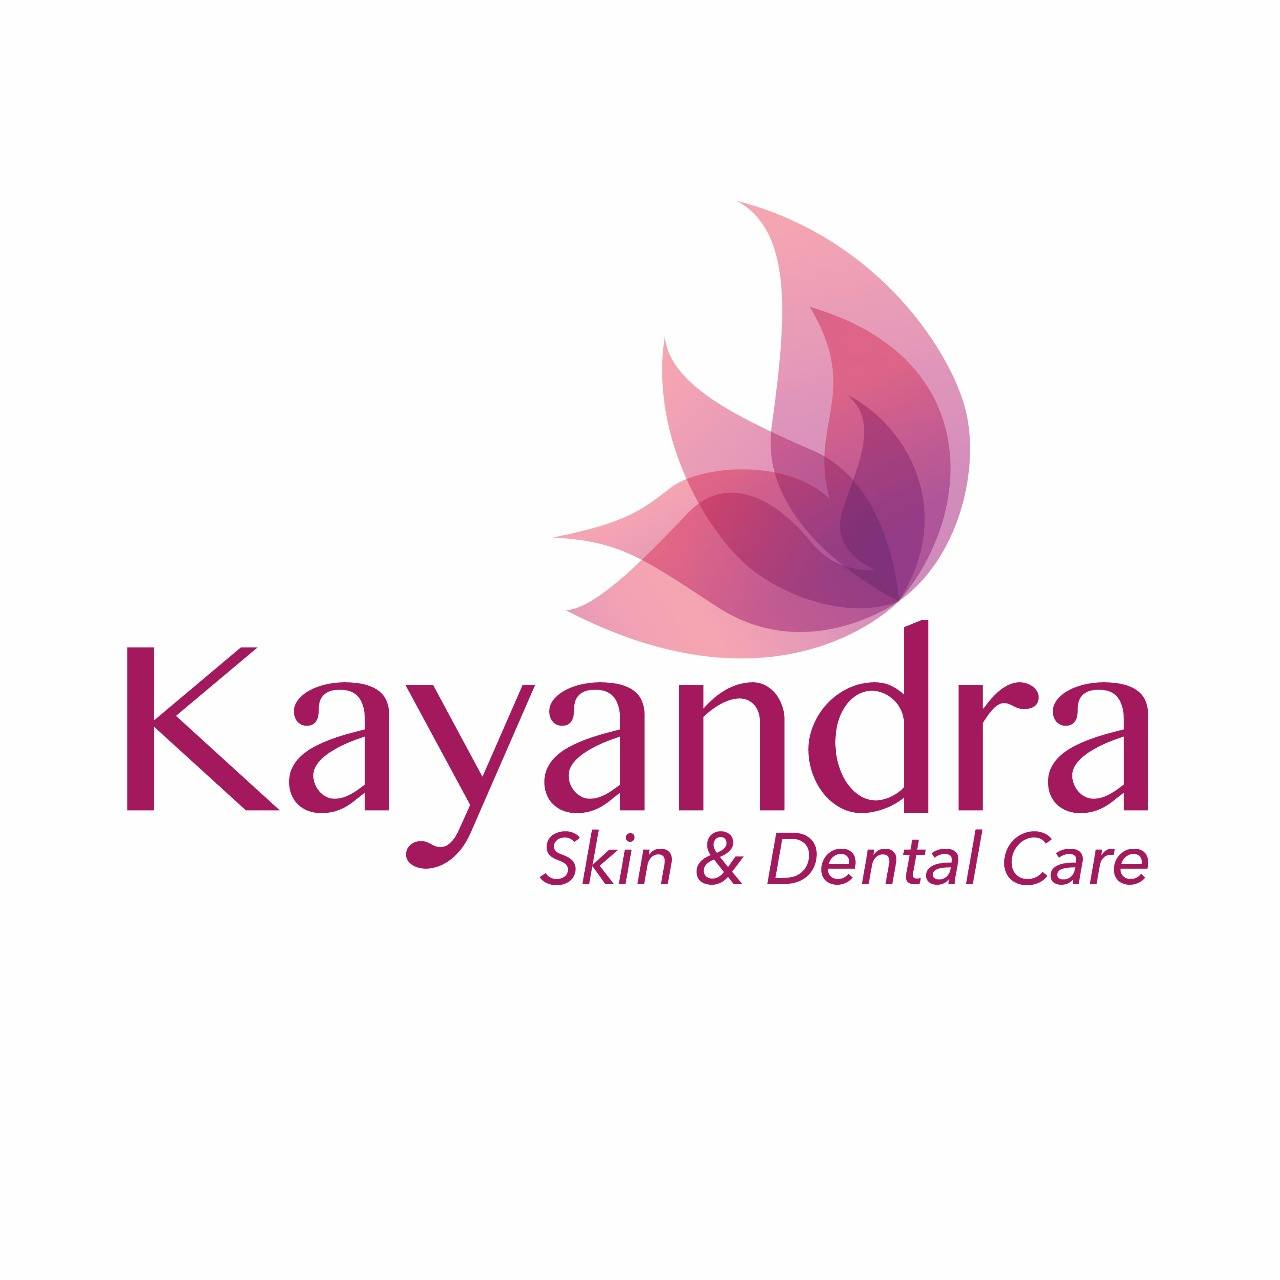 Kayandra Logo